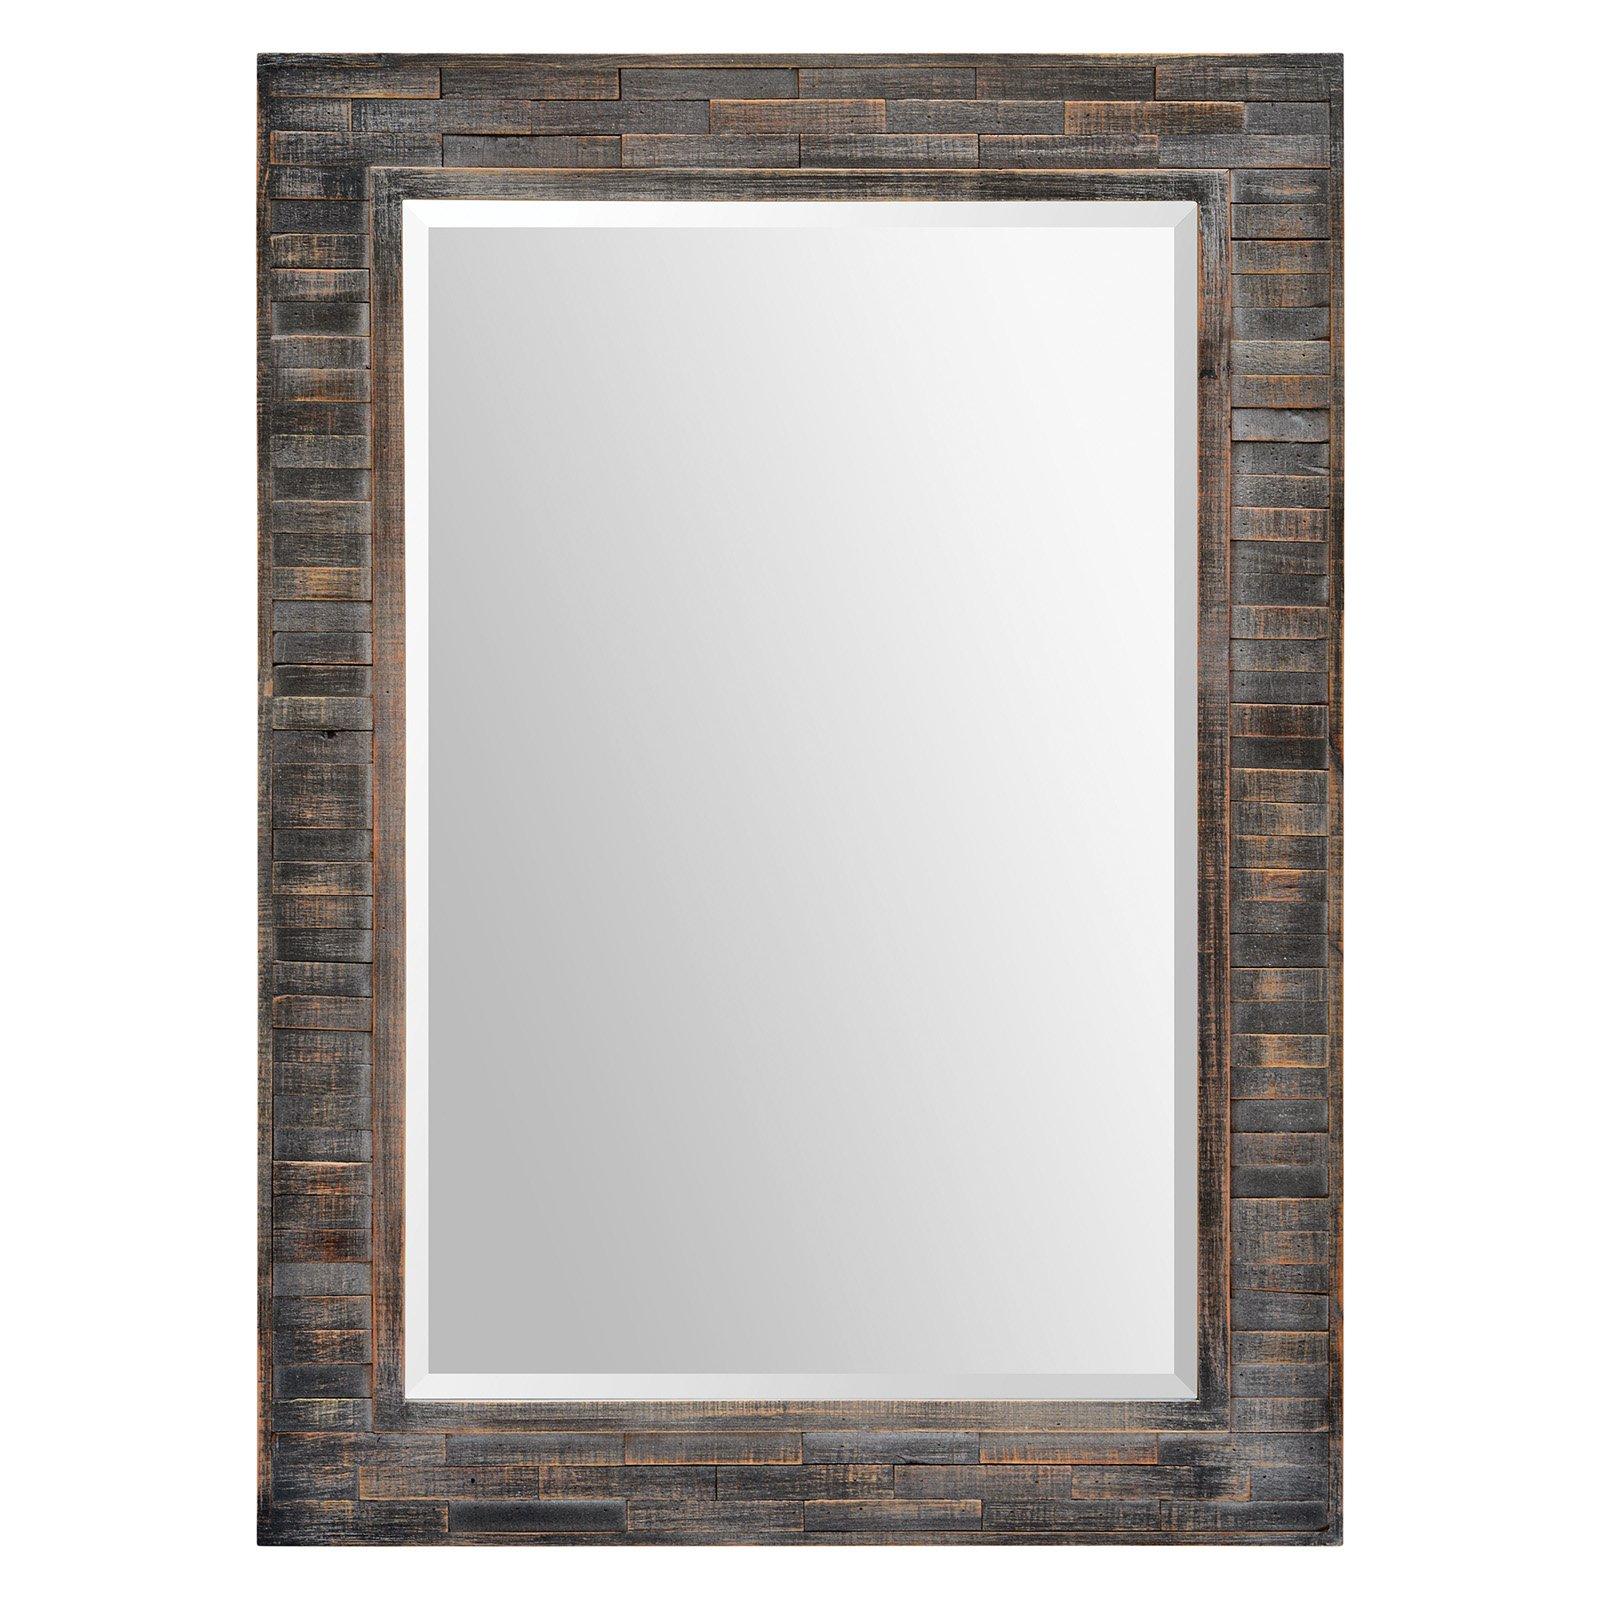 Ren-Wil Liuhana Wall Mirror - 30W x 42H in.